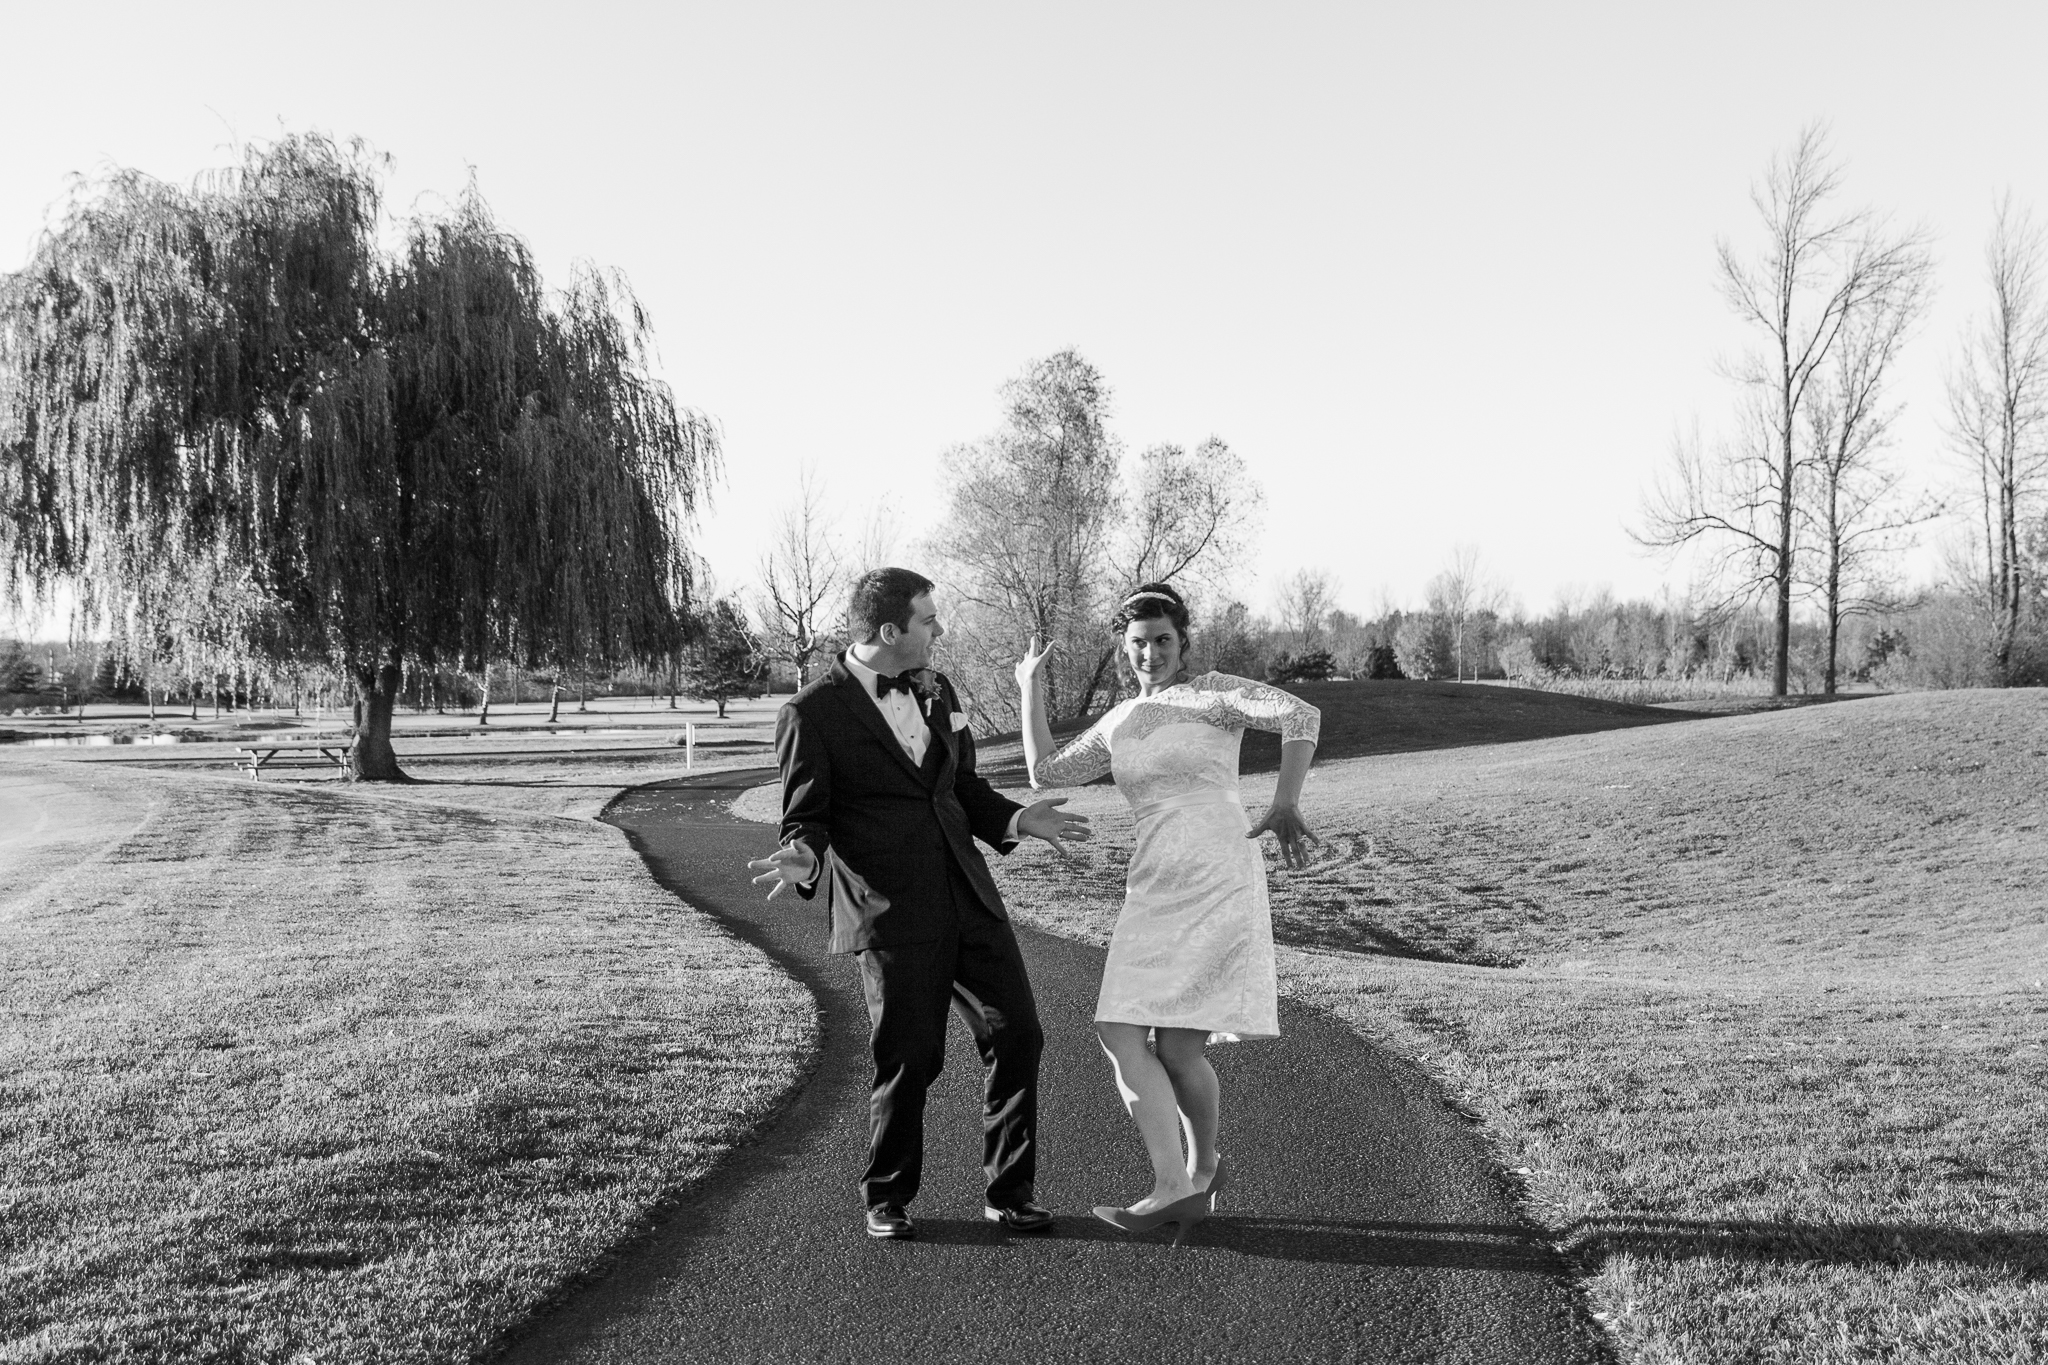 camuglia-whomstudio-chelsea_and_andy-nycphotographer-wedding-brooklyn-buffalo-timberlodge-047-0319.jpg